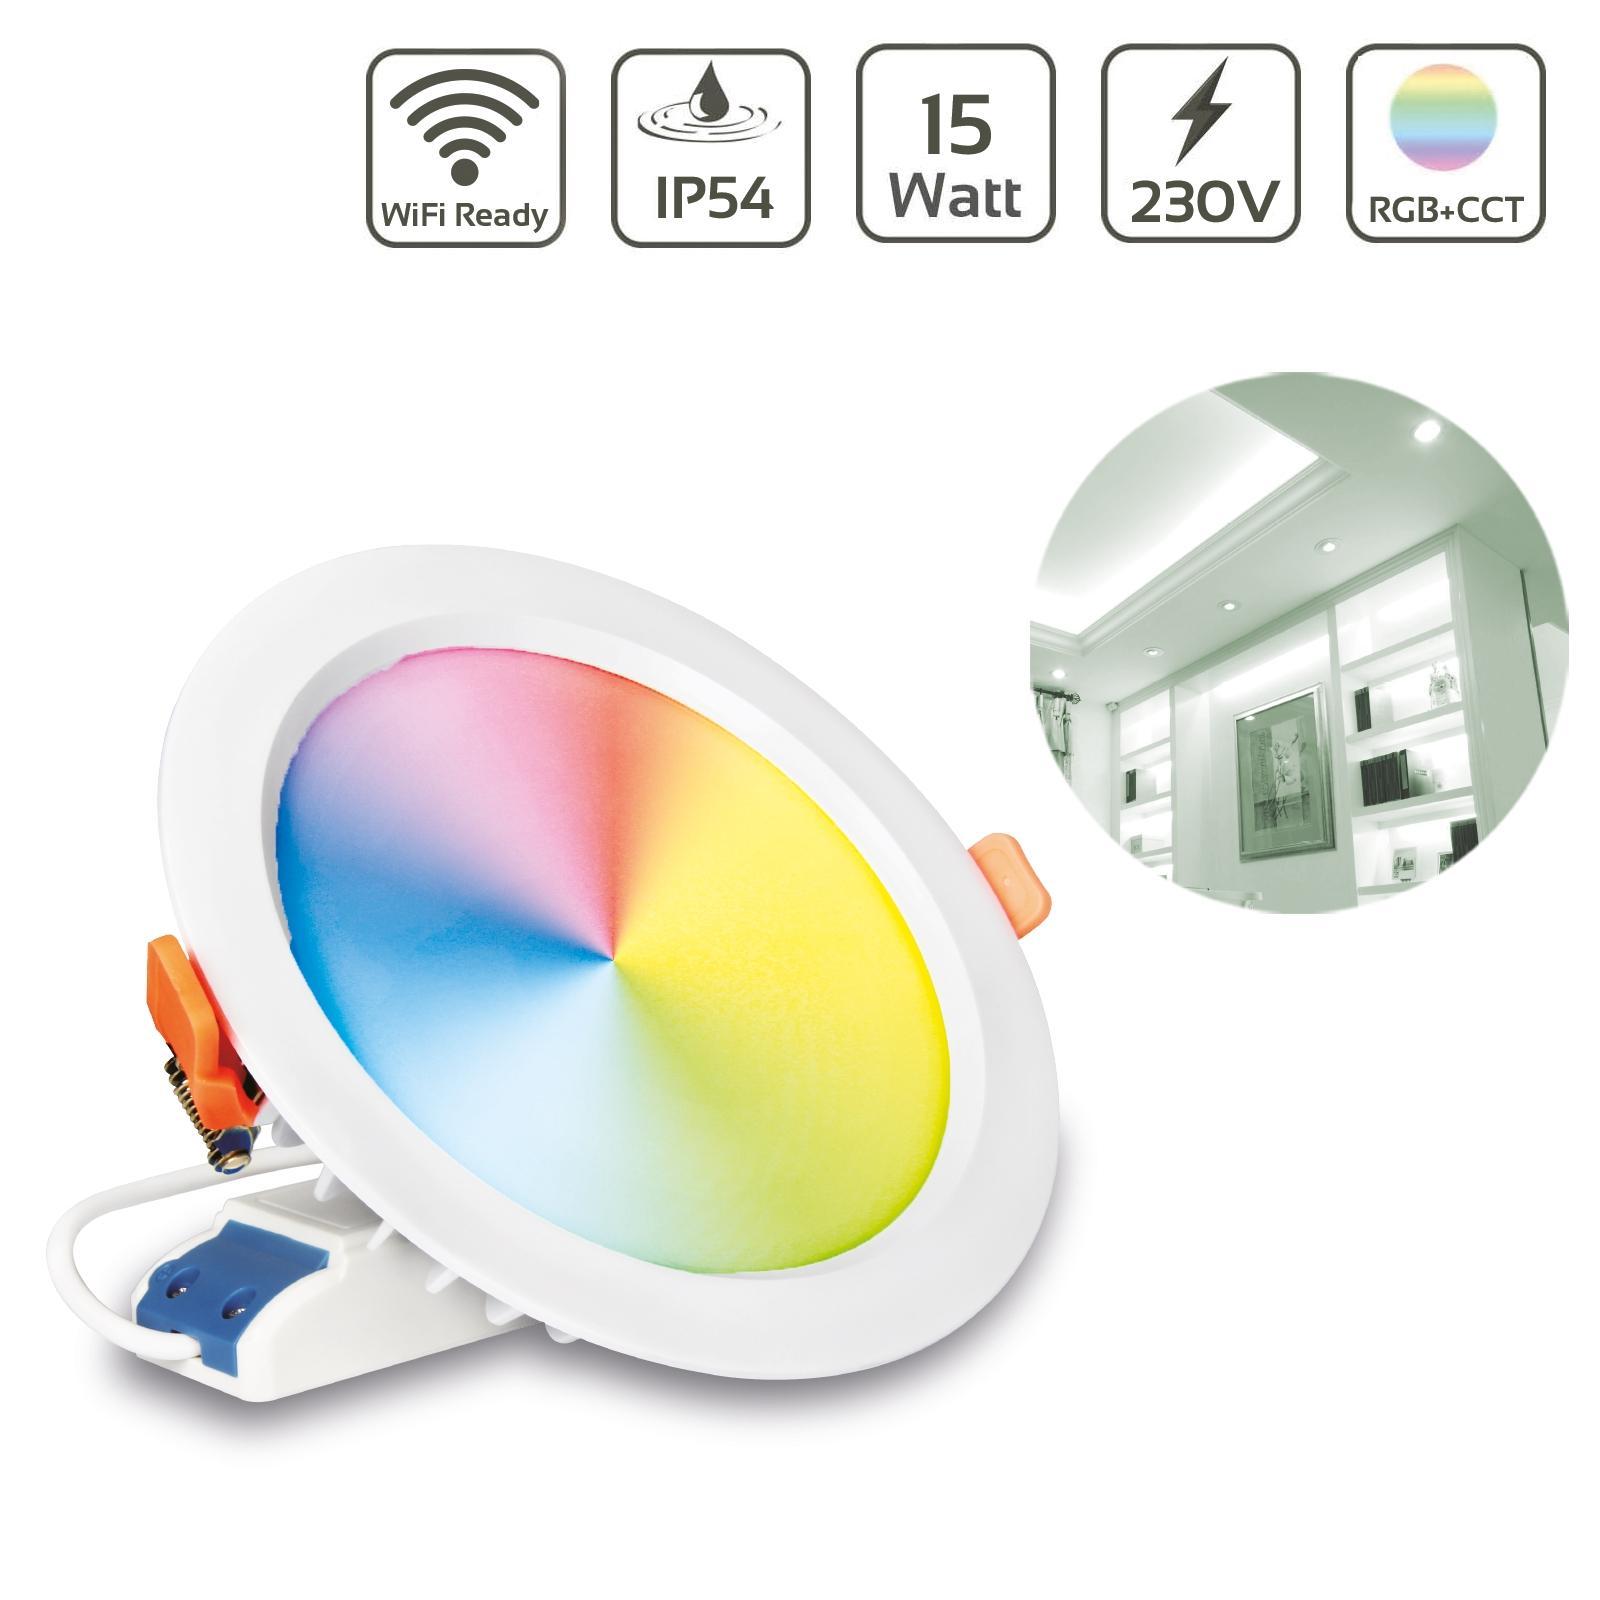 MiBoxer LED Einbaustrahler RGB+CCT 15W Ø190mm IP54 2,4GHz WiFiready FUT069